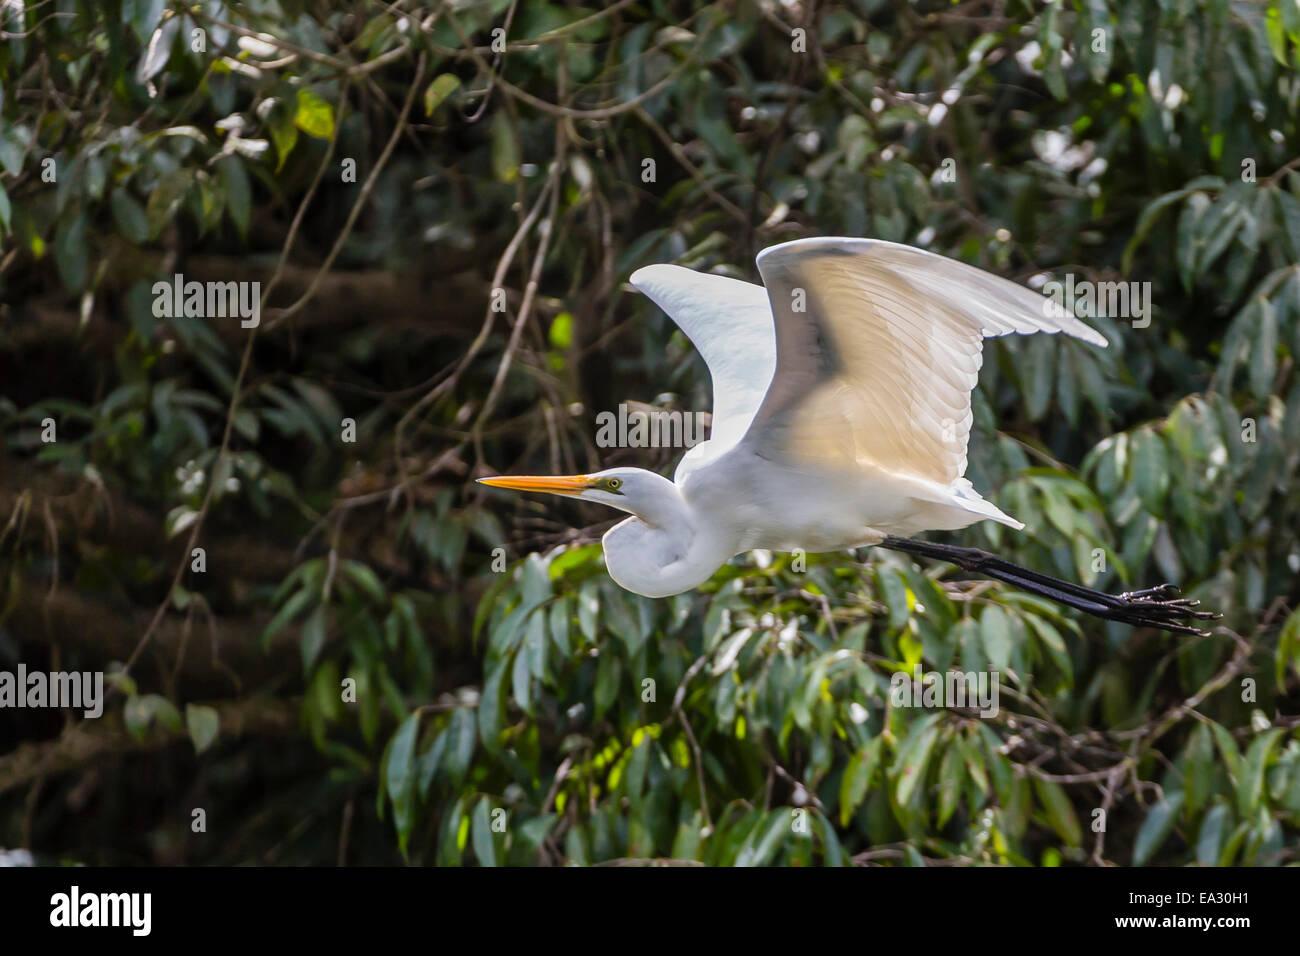 An adult eastern great egret (Ardea alba) in flight on the Daintree River, Daintree rain forest, Queensland, Australia, - Stock Image